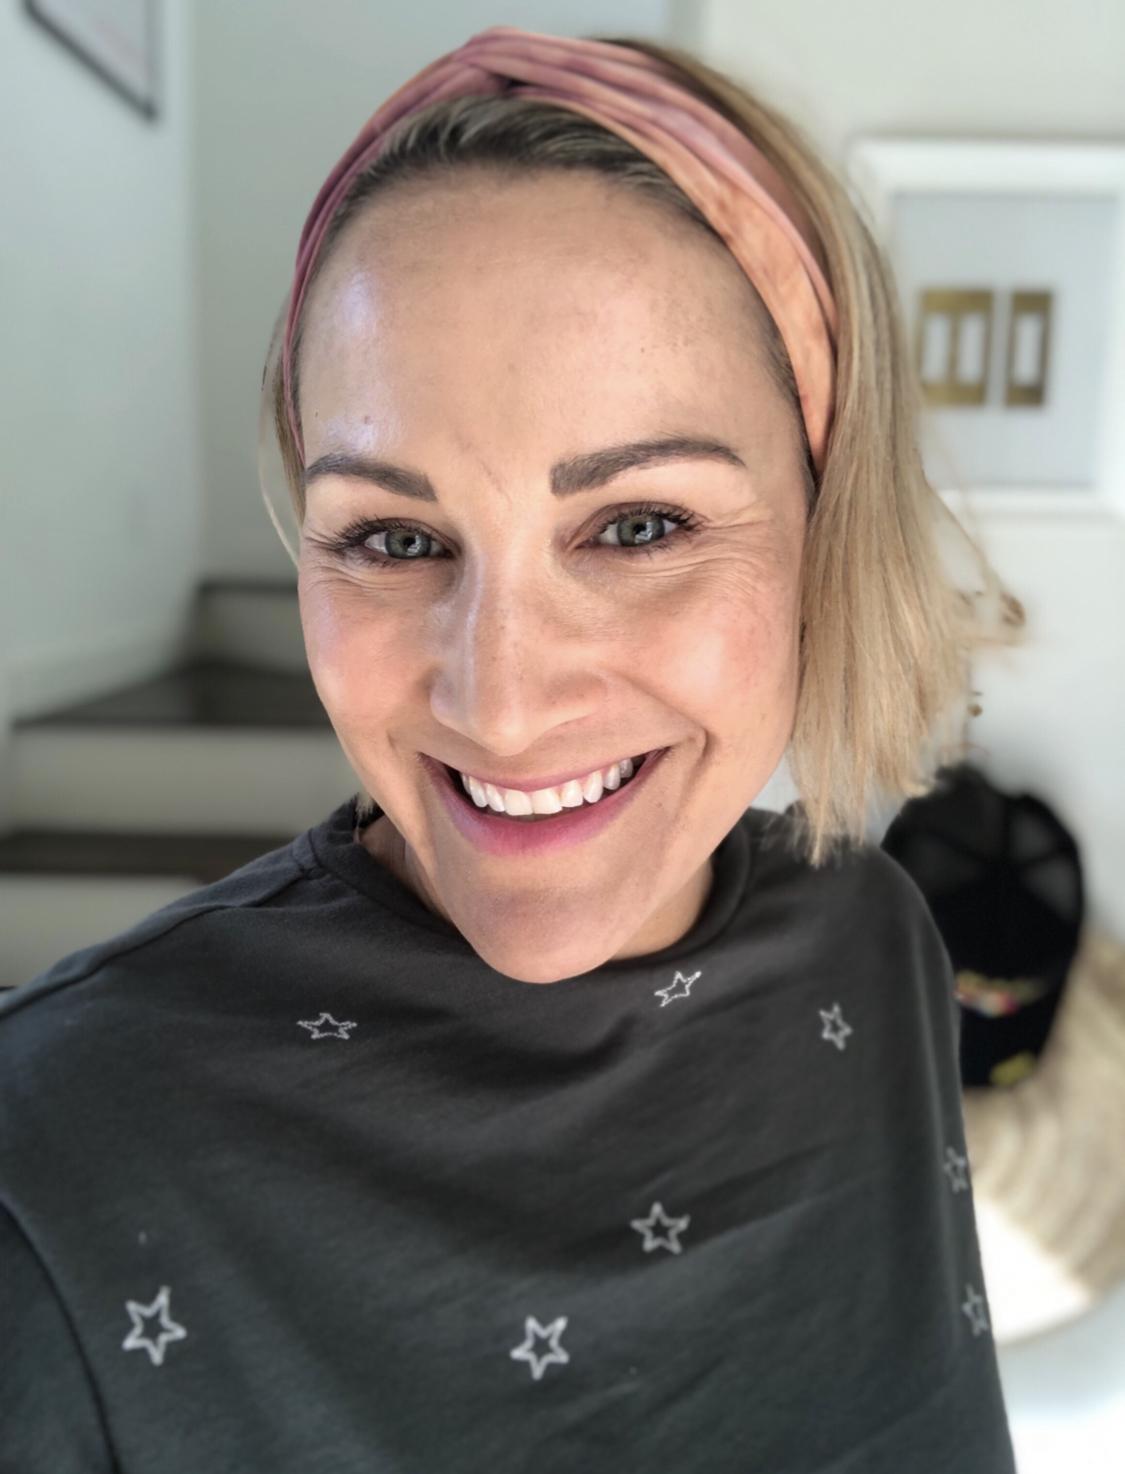 How Microneedling Changed My Skin